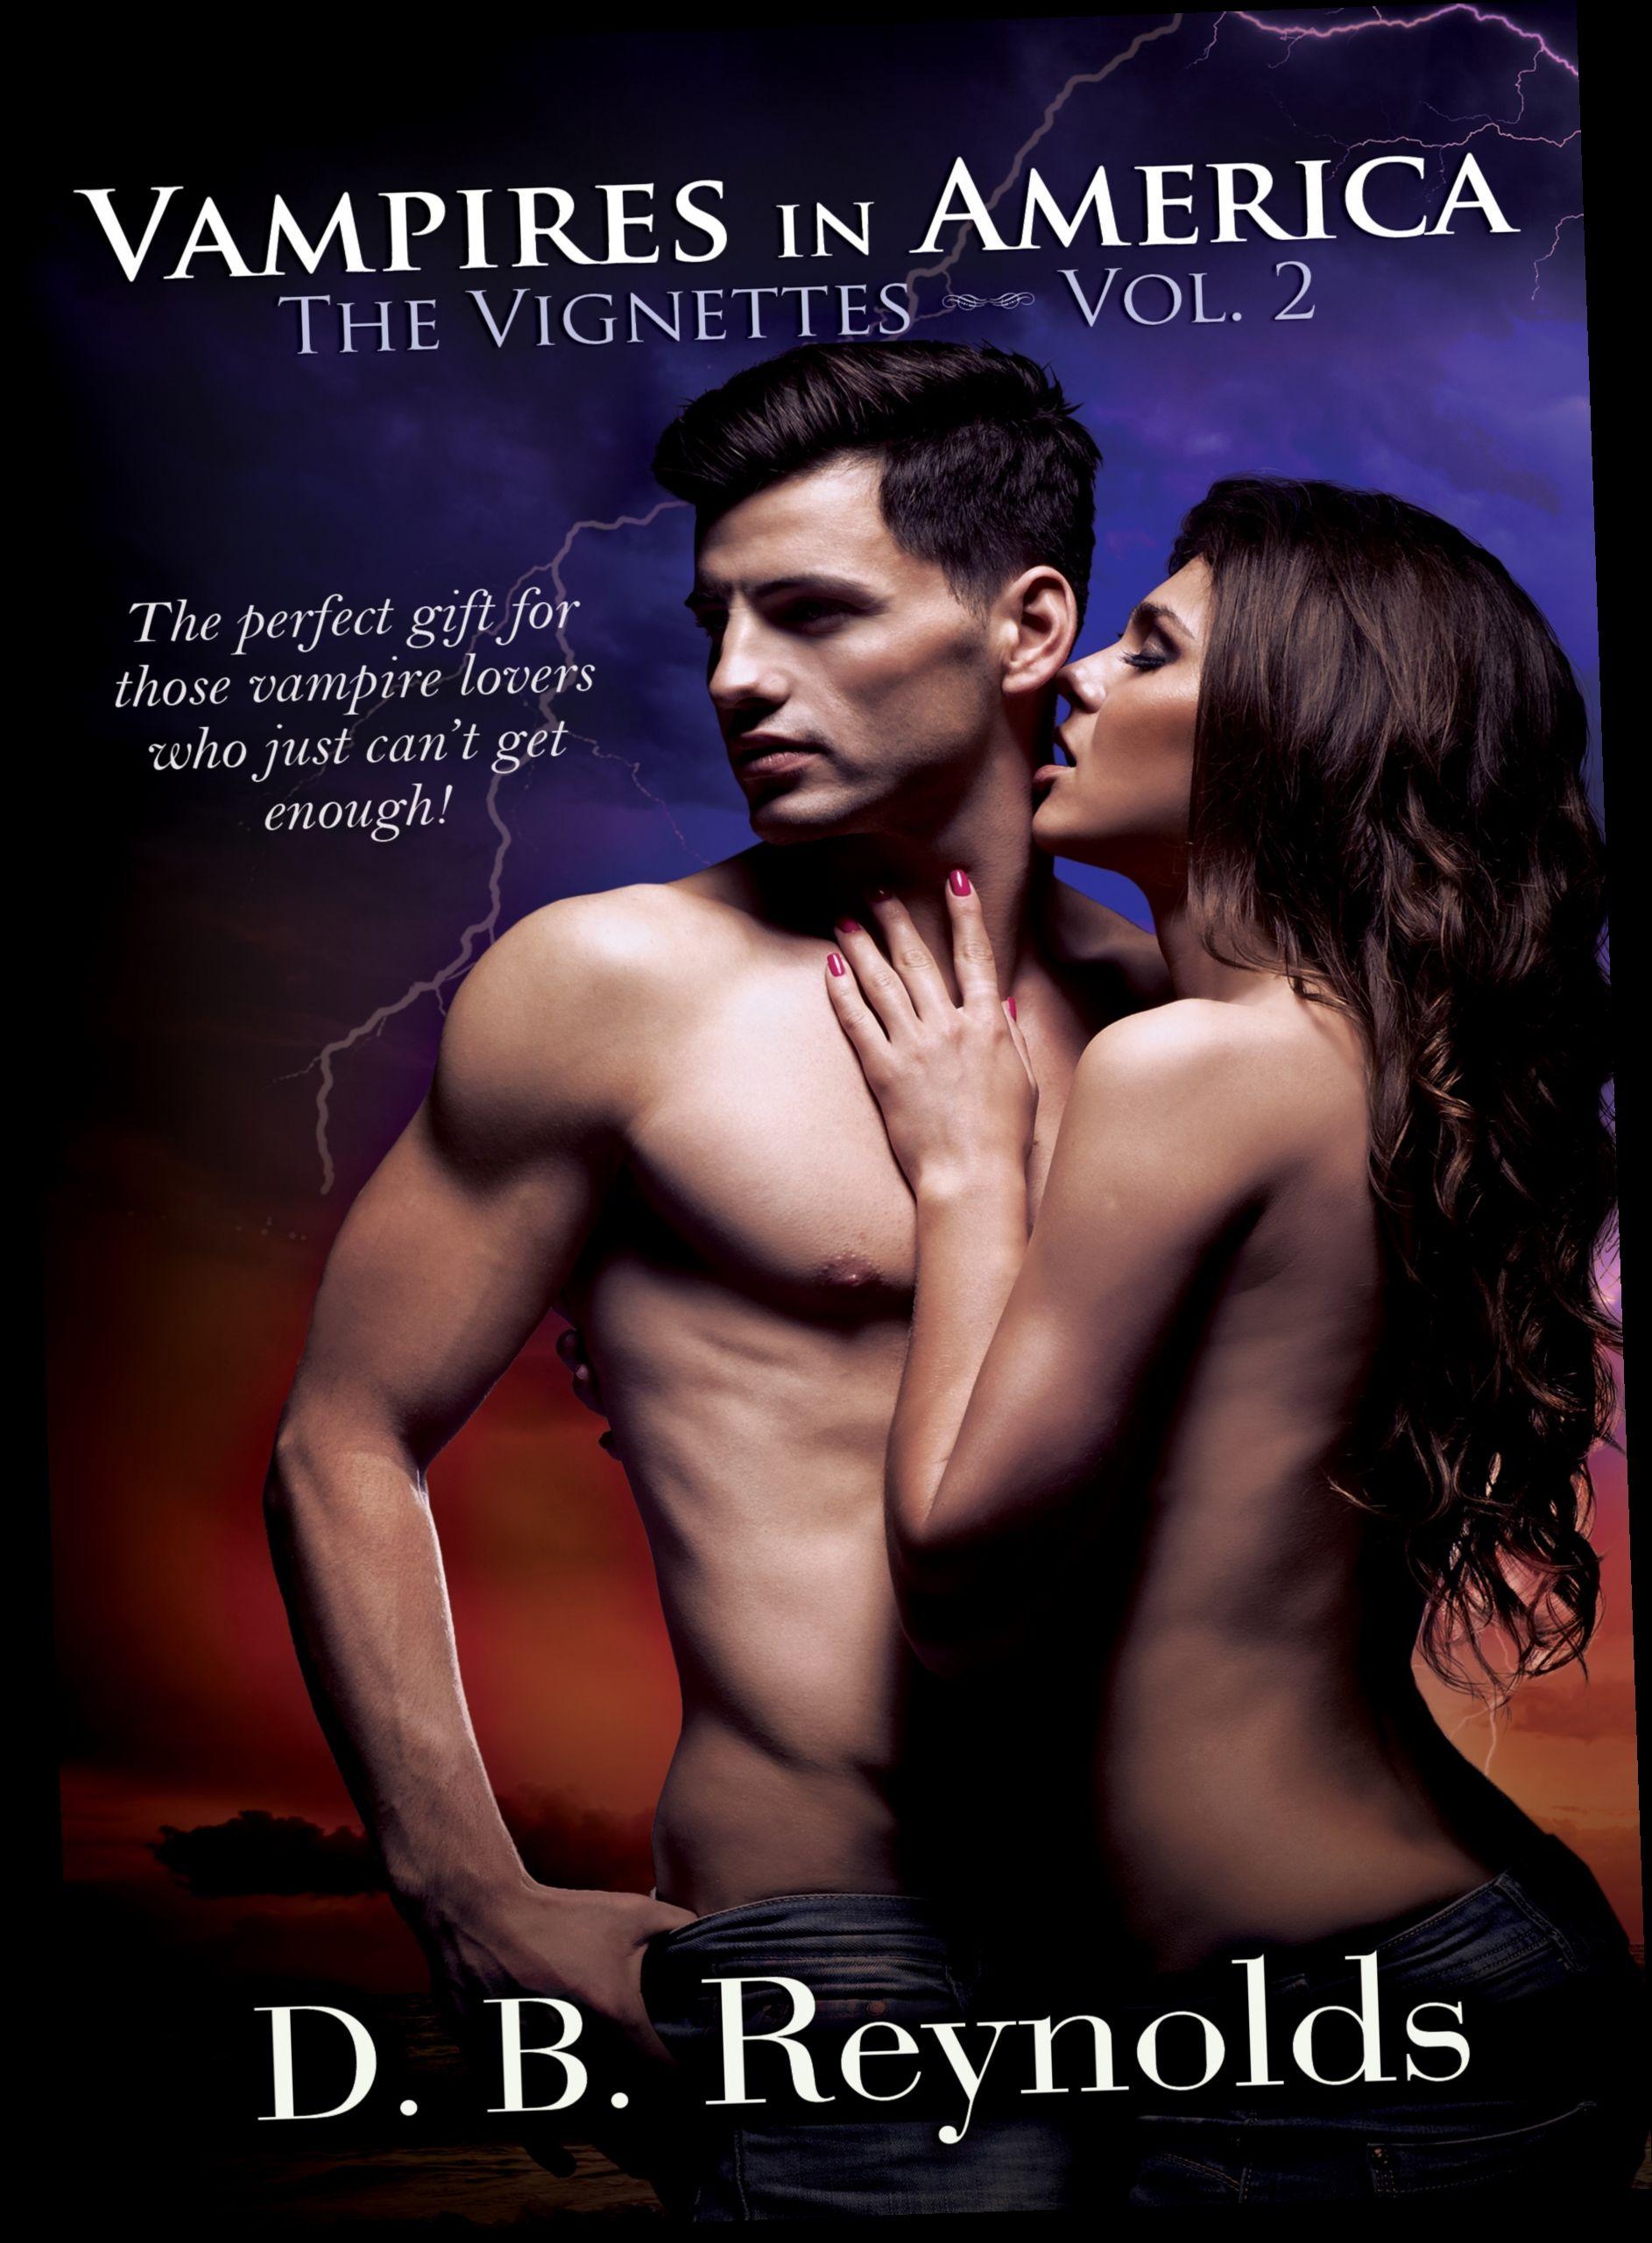 Ebook Pdf Epub Download Vampires In America The Vignettes Volume 2 By D B Reynolds